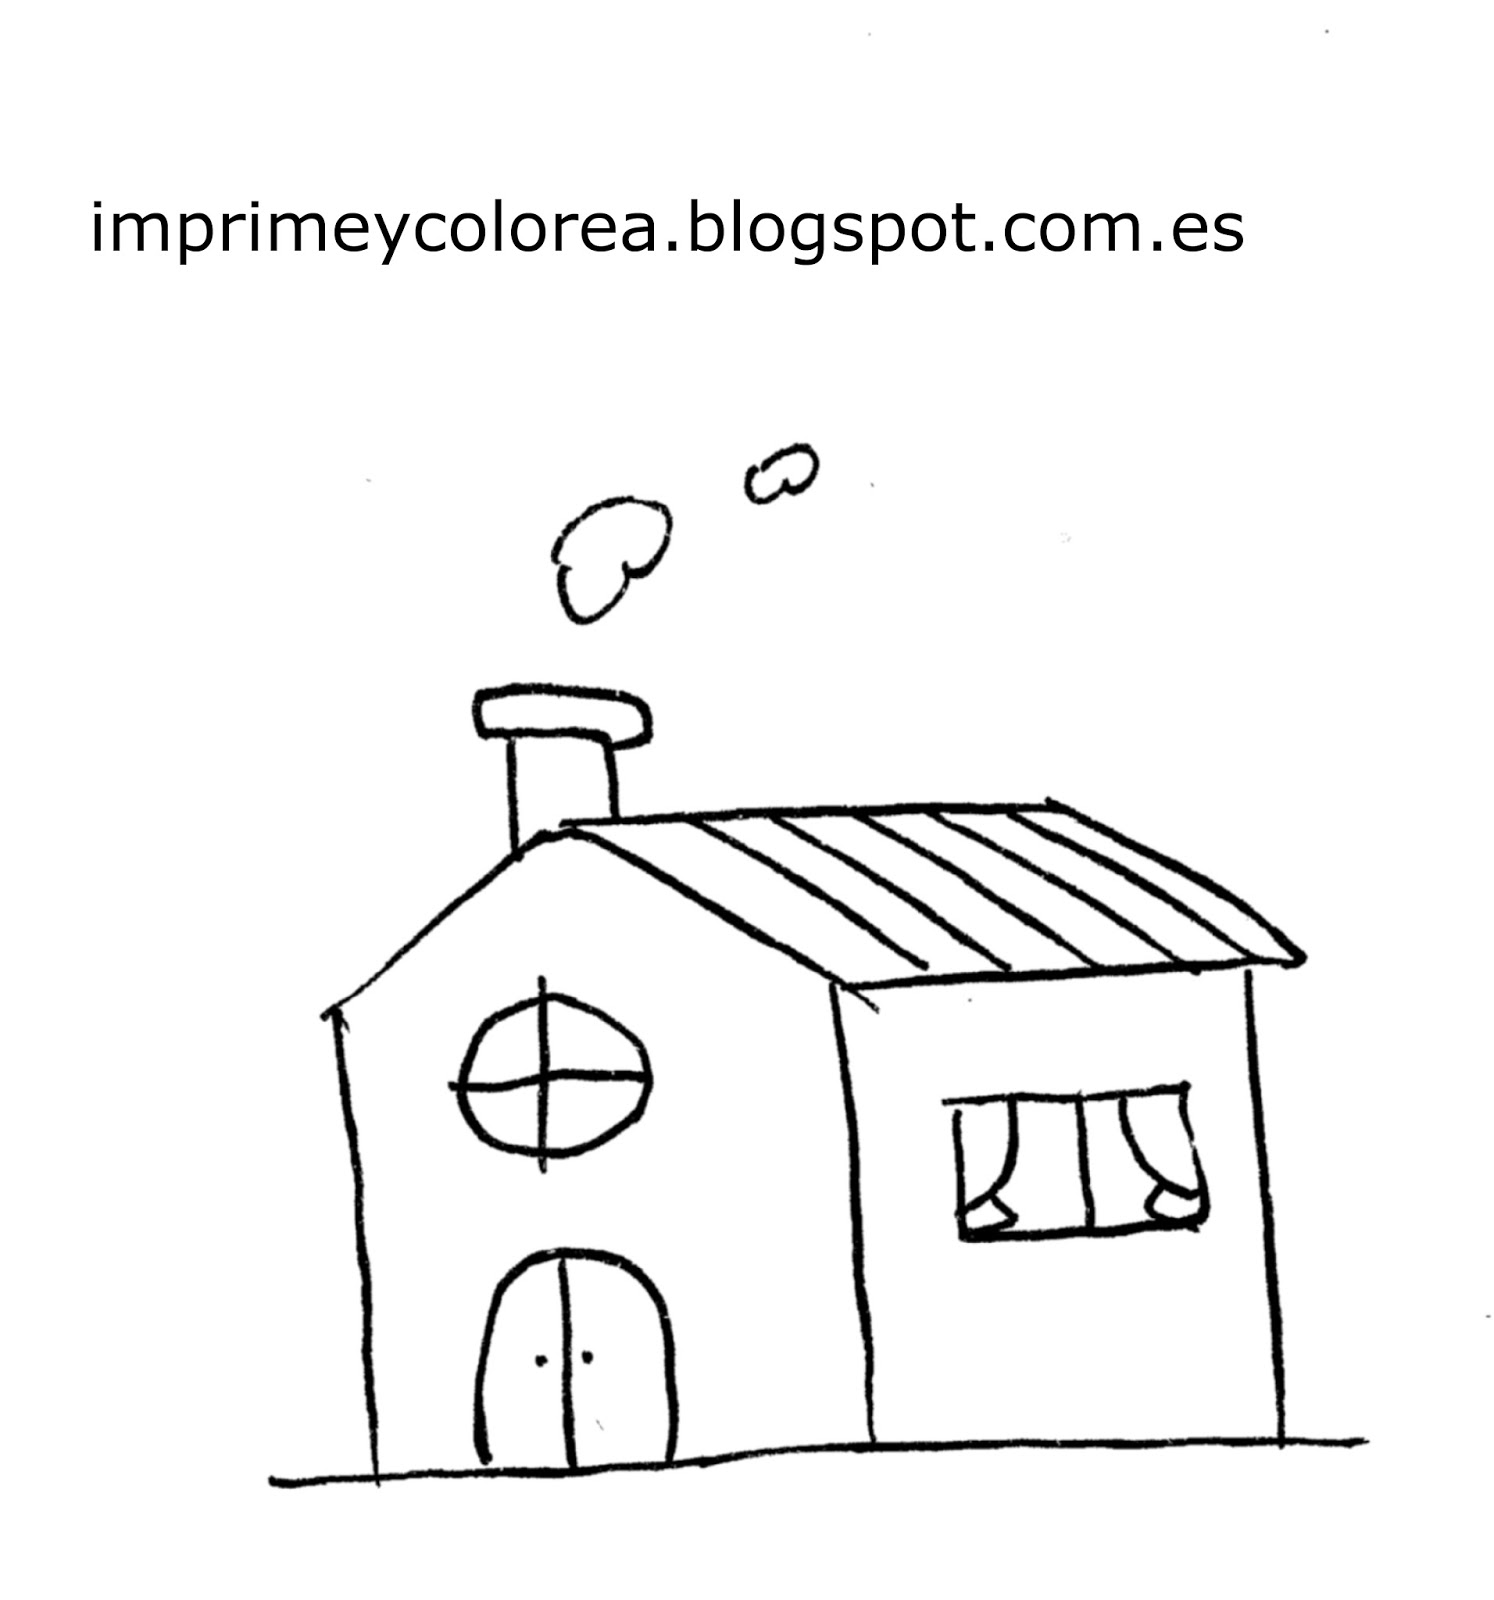 Imagenes De Casas Para Colorear E Imprimir